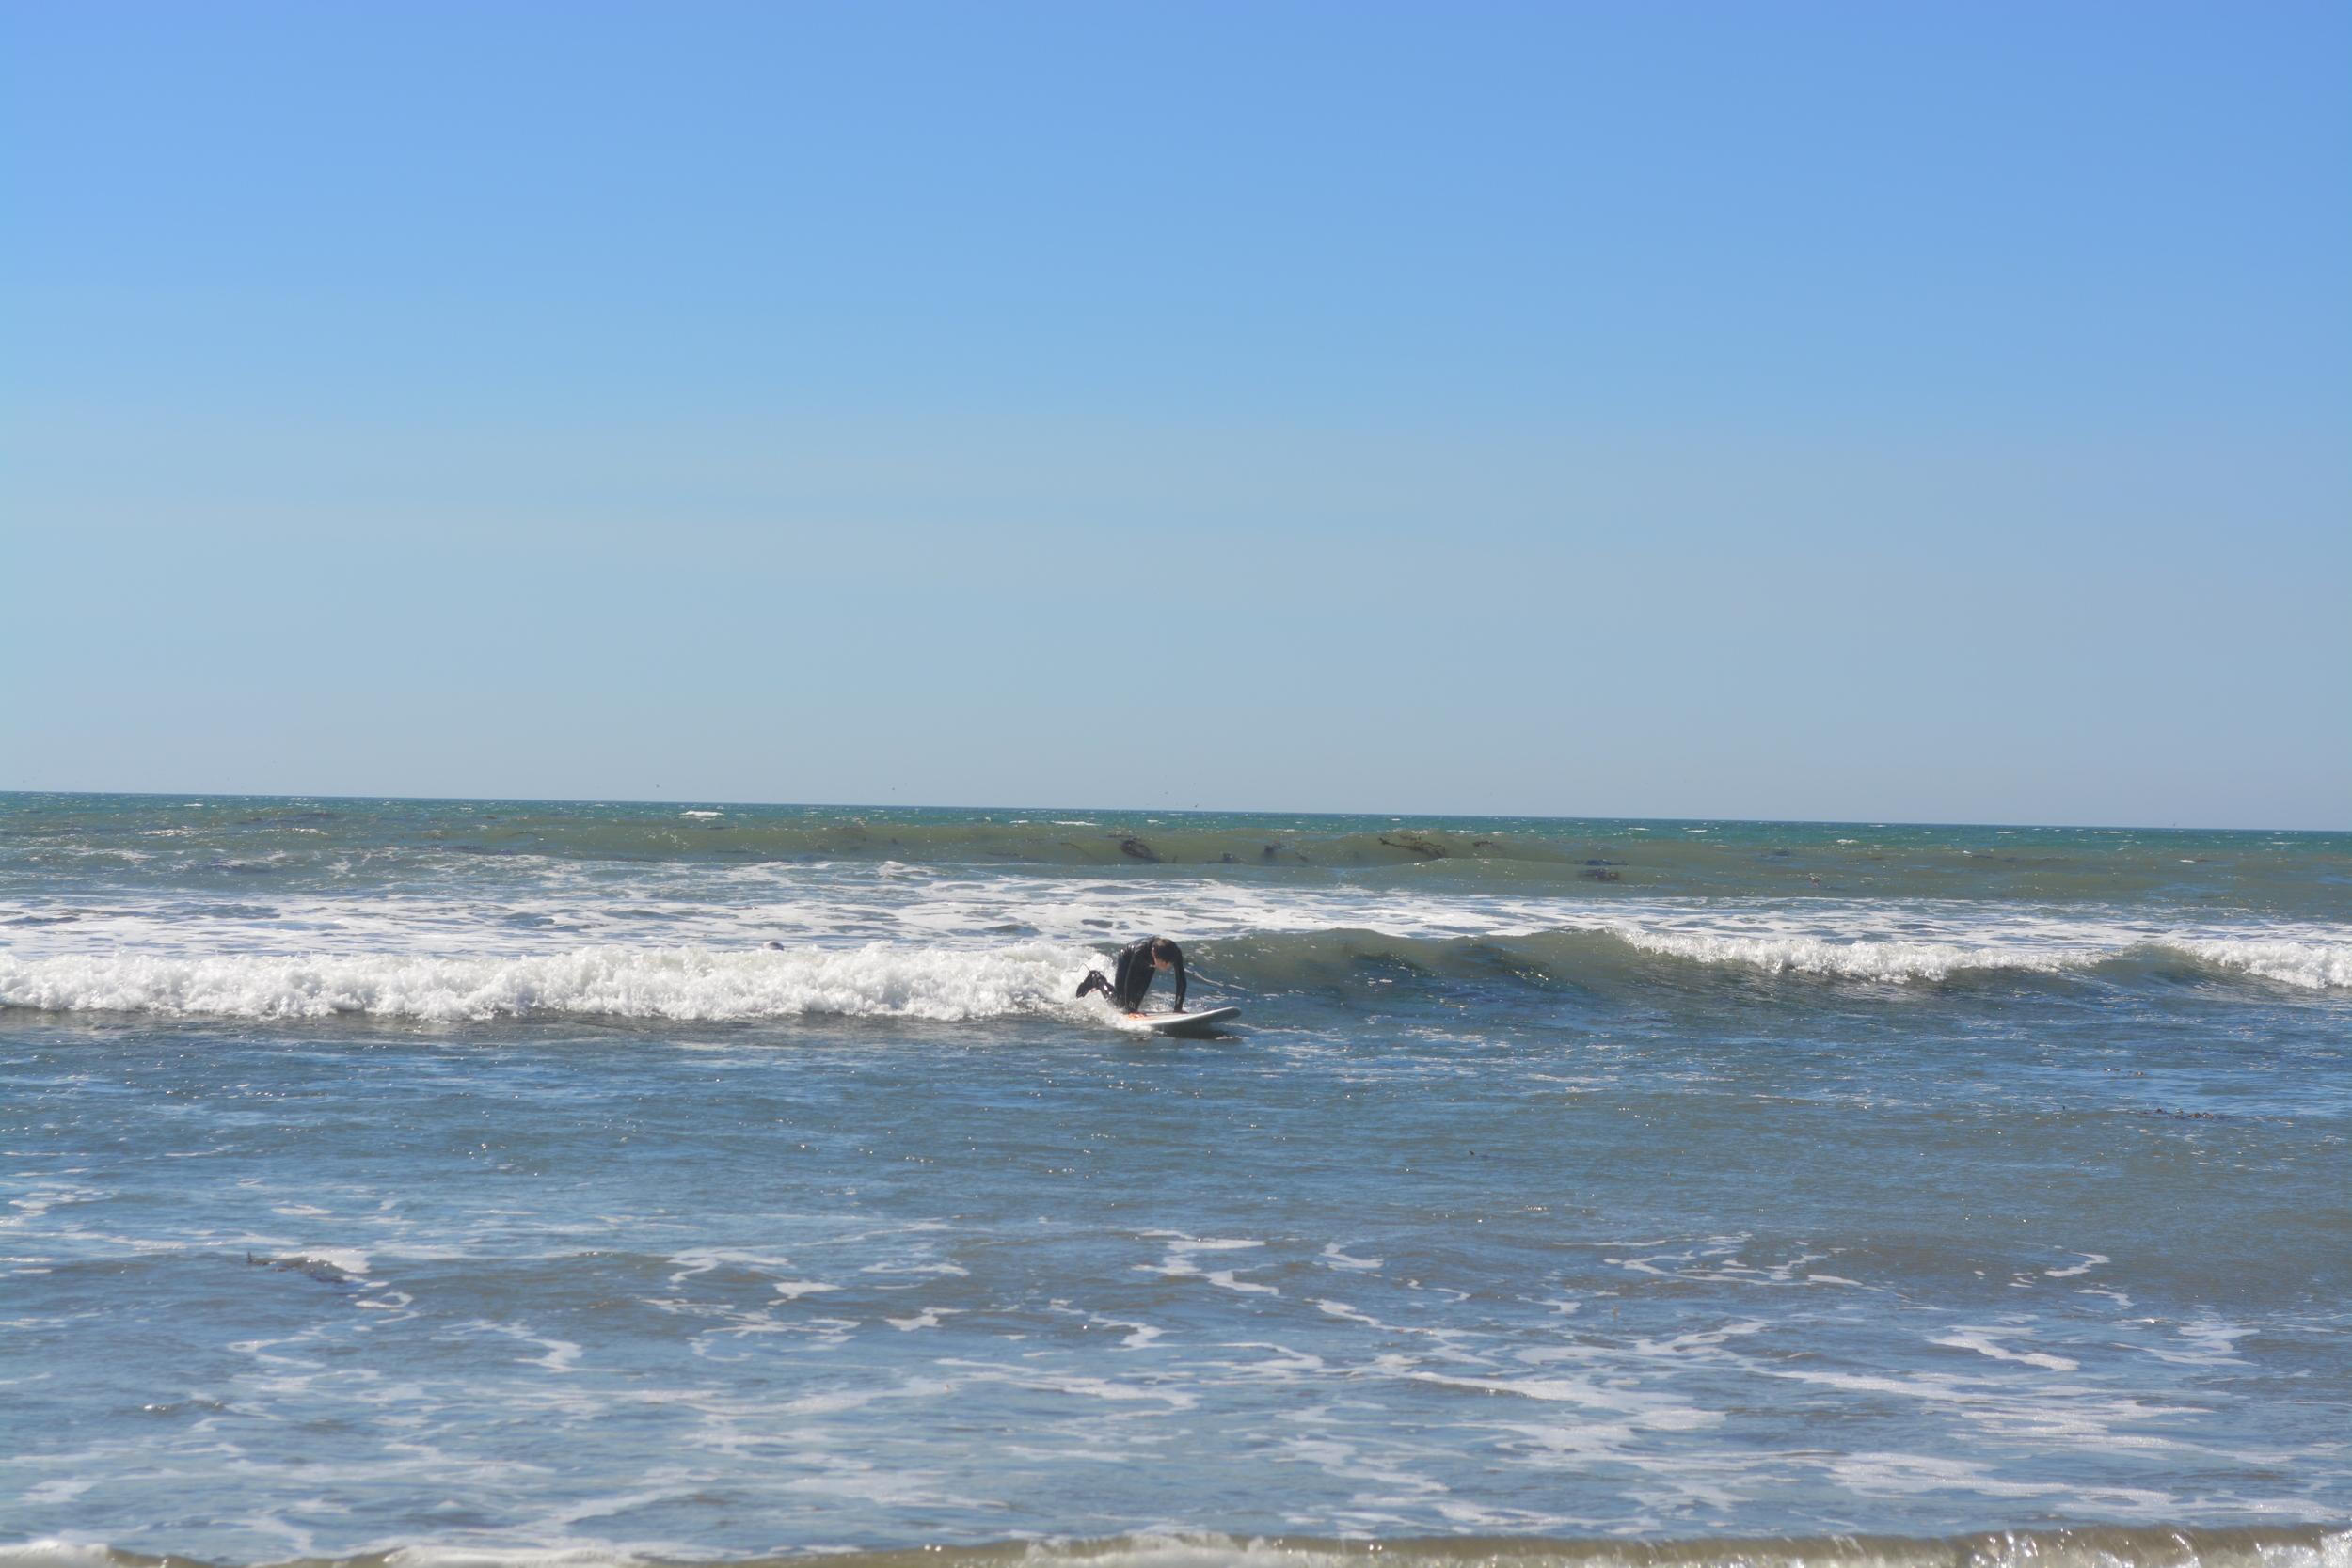 Baja California 10-5-13 Shipwrecks Surfing Adventure Ocean Experience Surf School San Diego (16).JPG